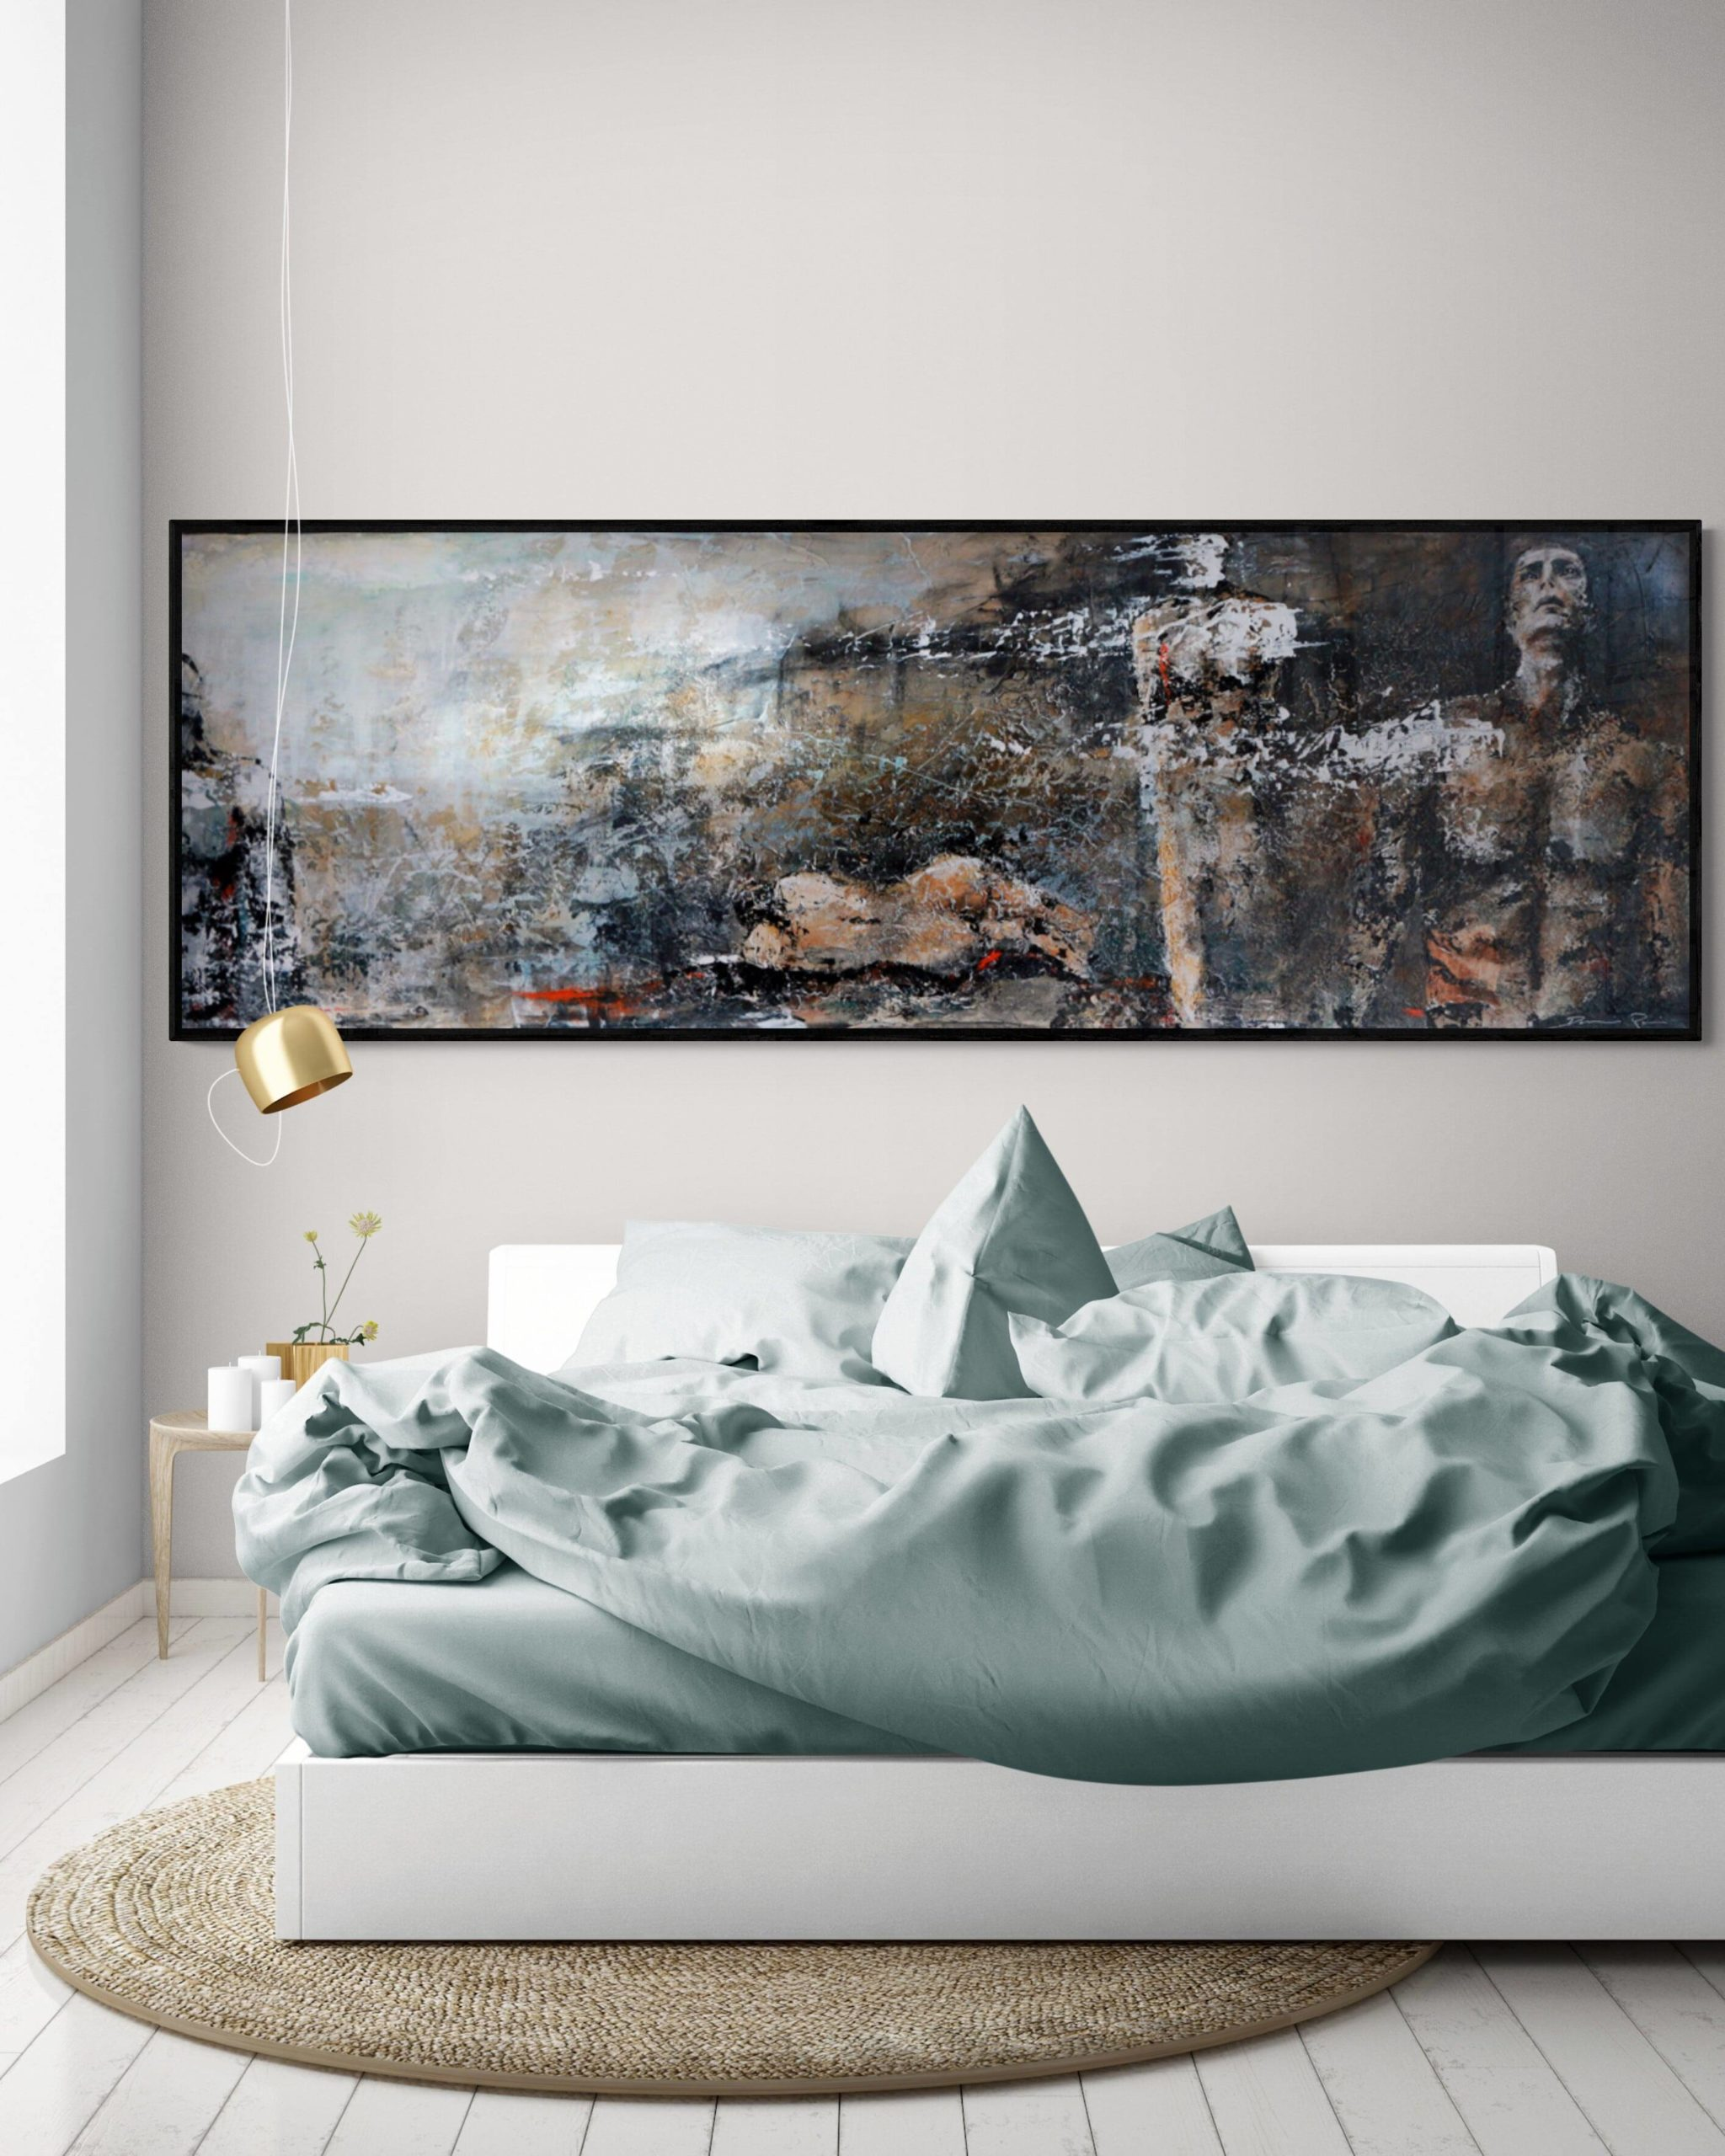 Brumes peinture acrylique Damien Rais 1